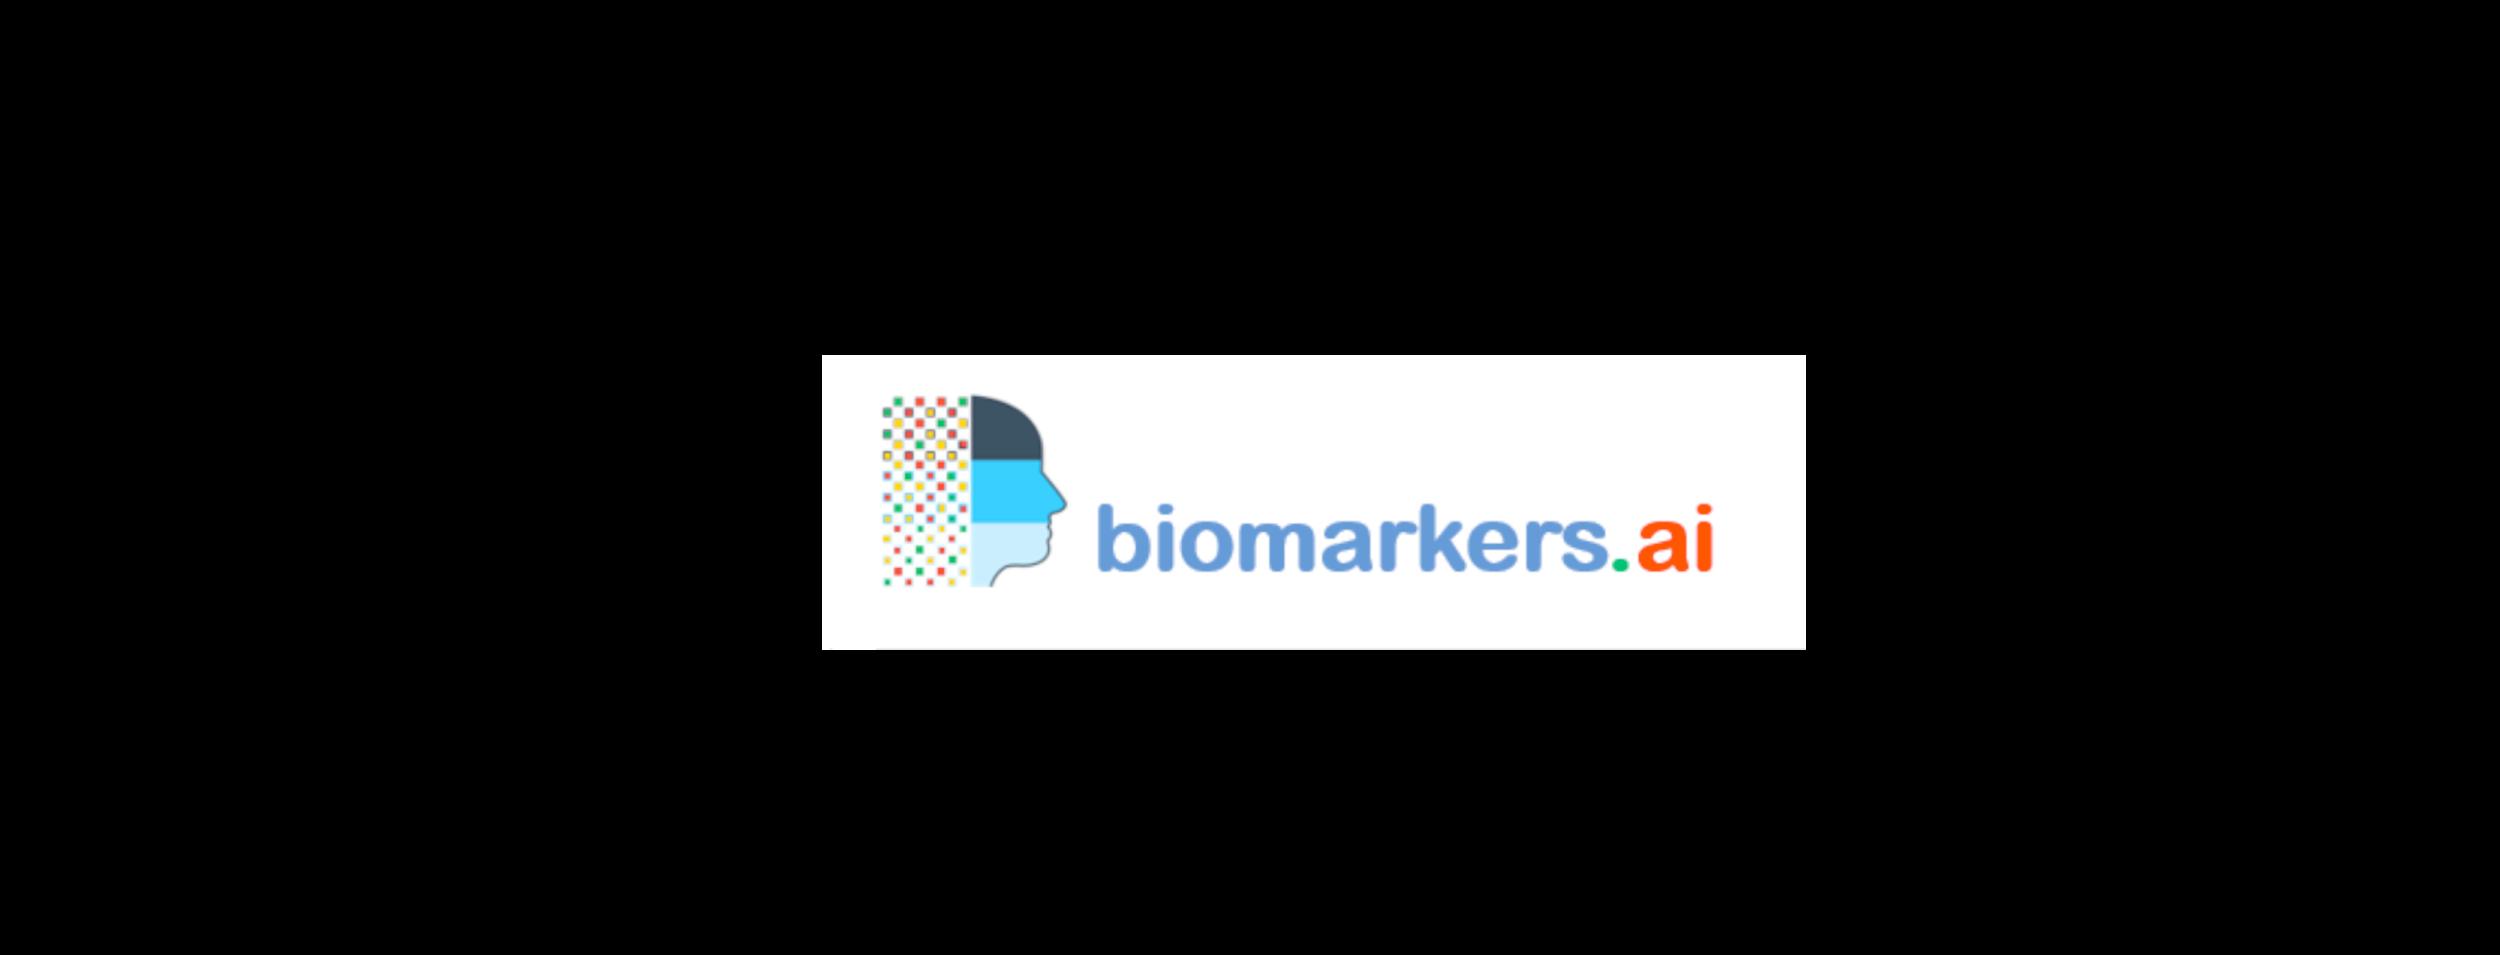 biomakers-01.png